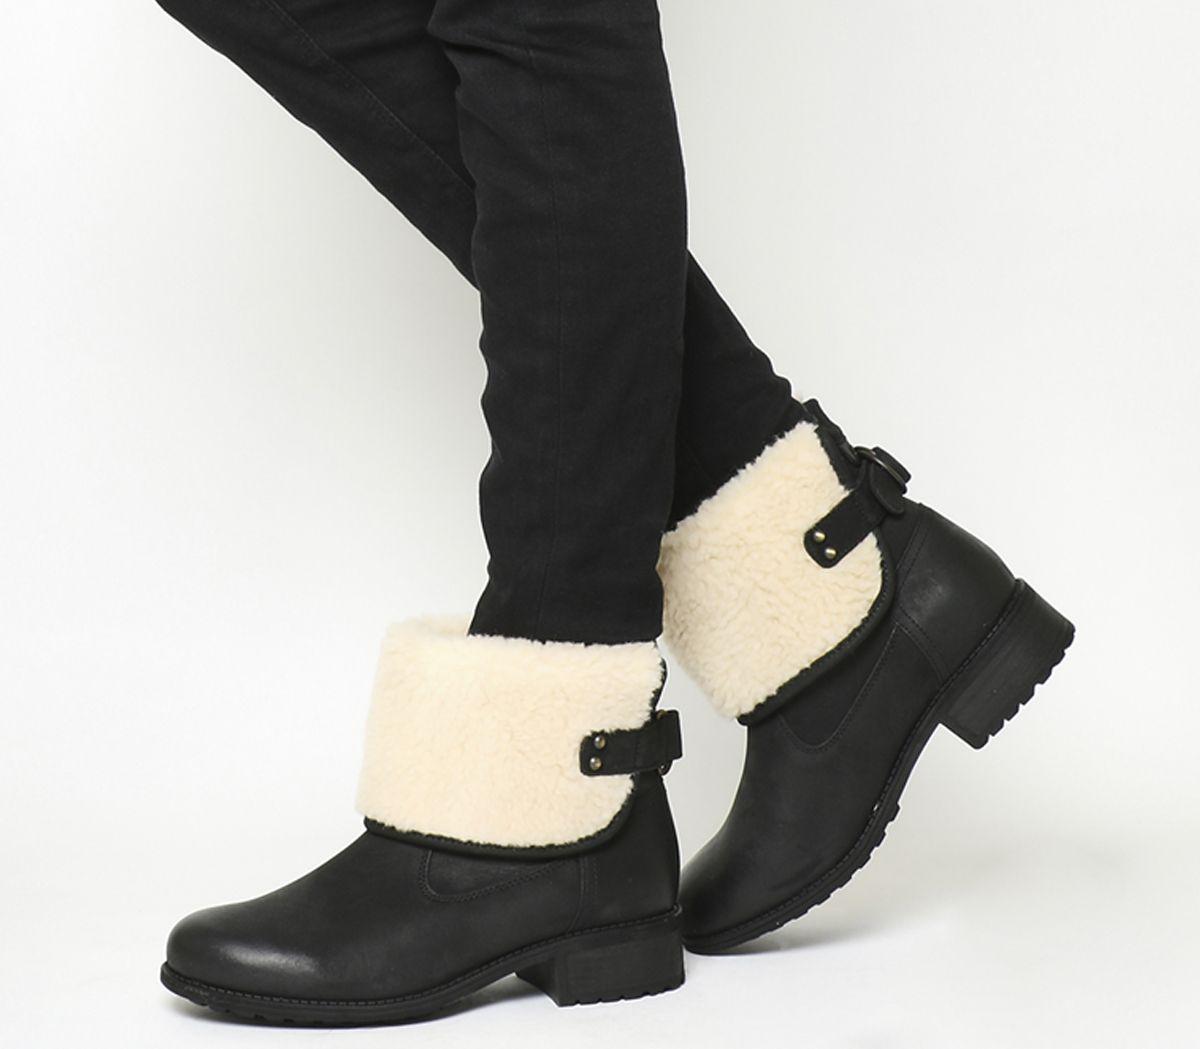 ce6742ad4b6 Aldon Fold Down Boots